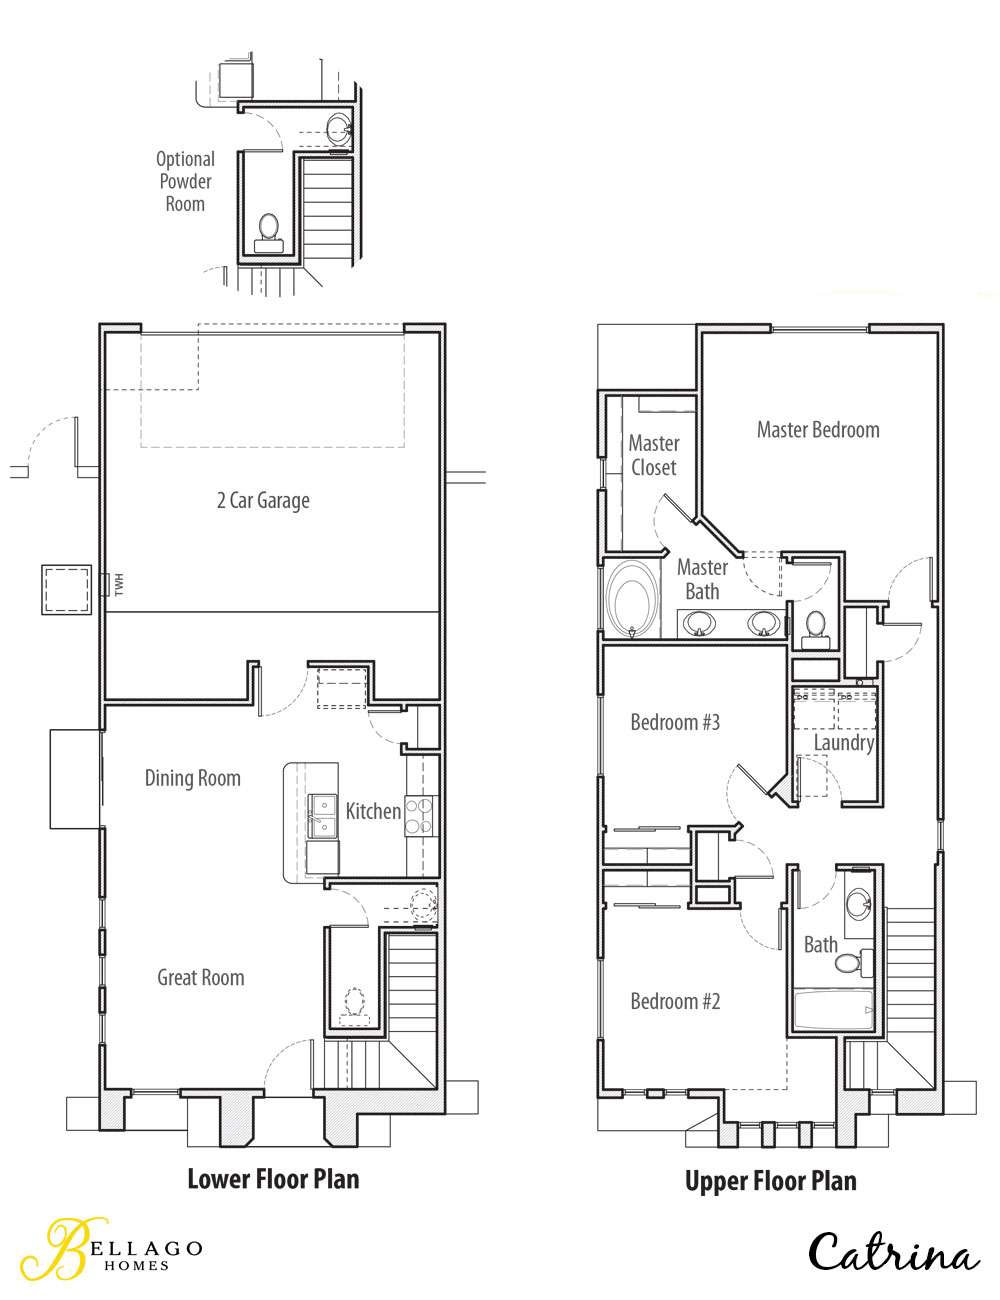 Catrina Floor Plan